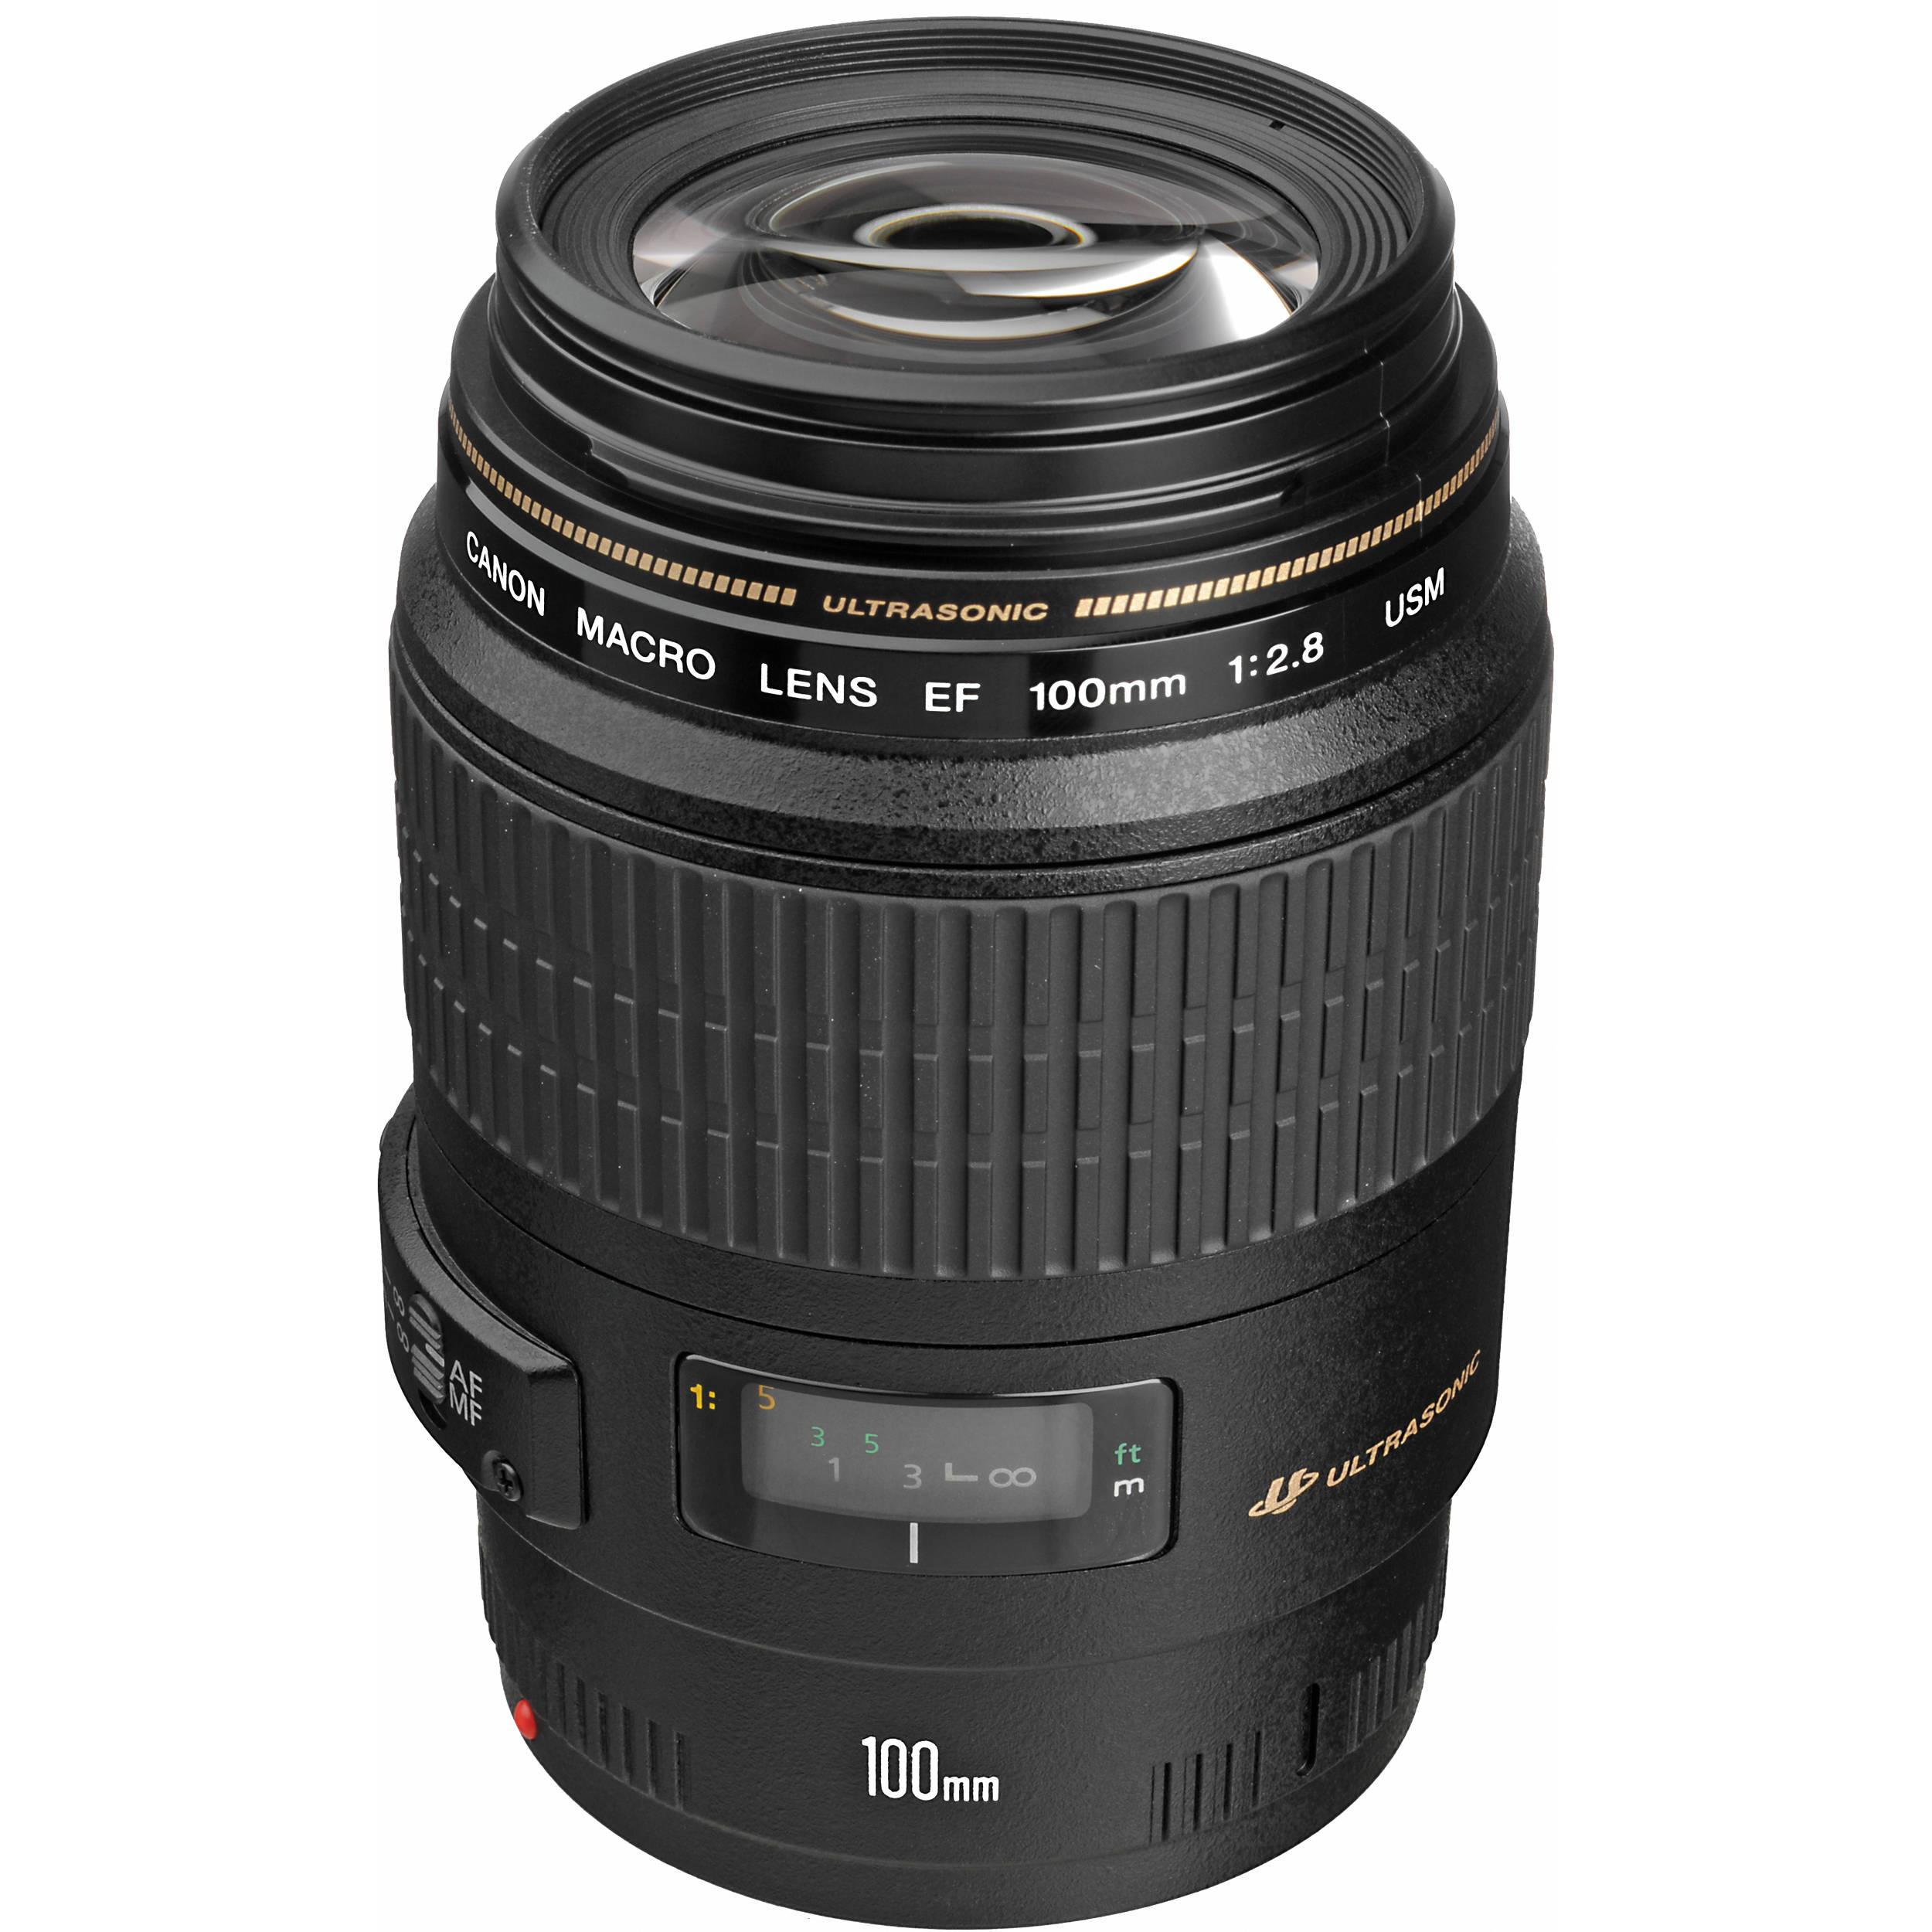 Canon 100mm f/2.8 Macro USM - LensAuthority